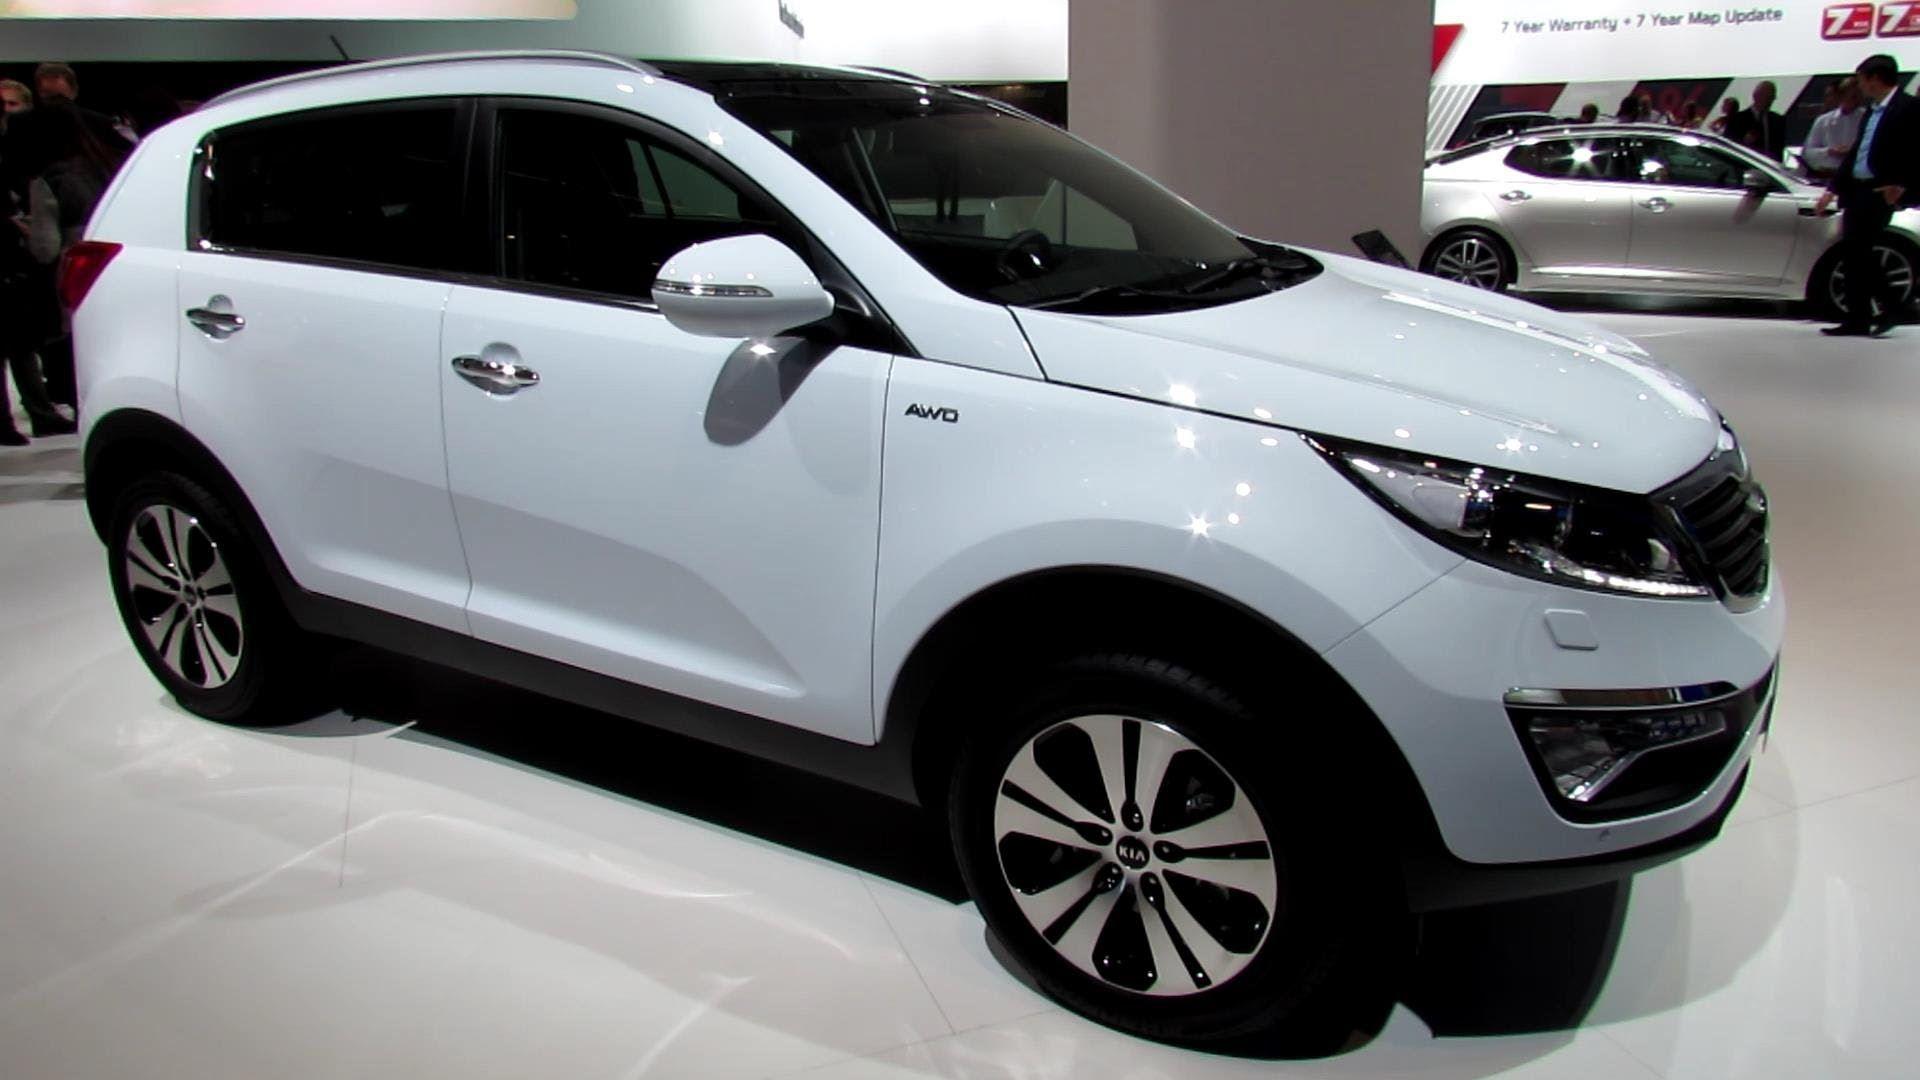 2014 KIA Sportage CRDi AWD Diesel - Exterior and Interior Walkaround